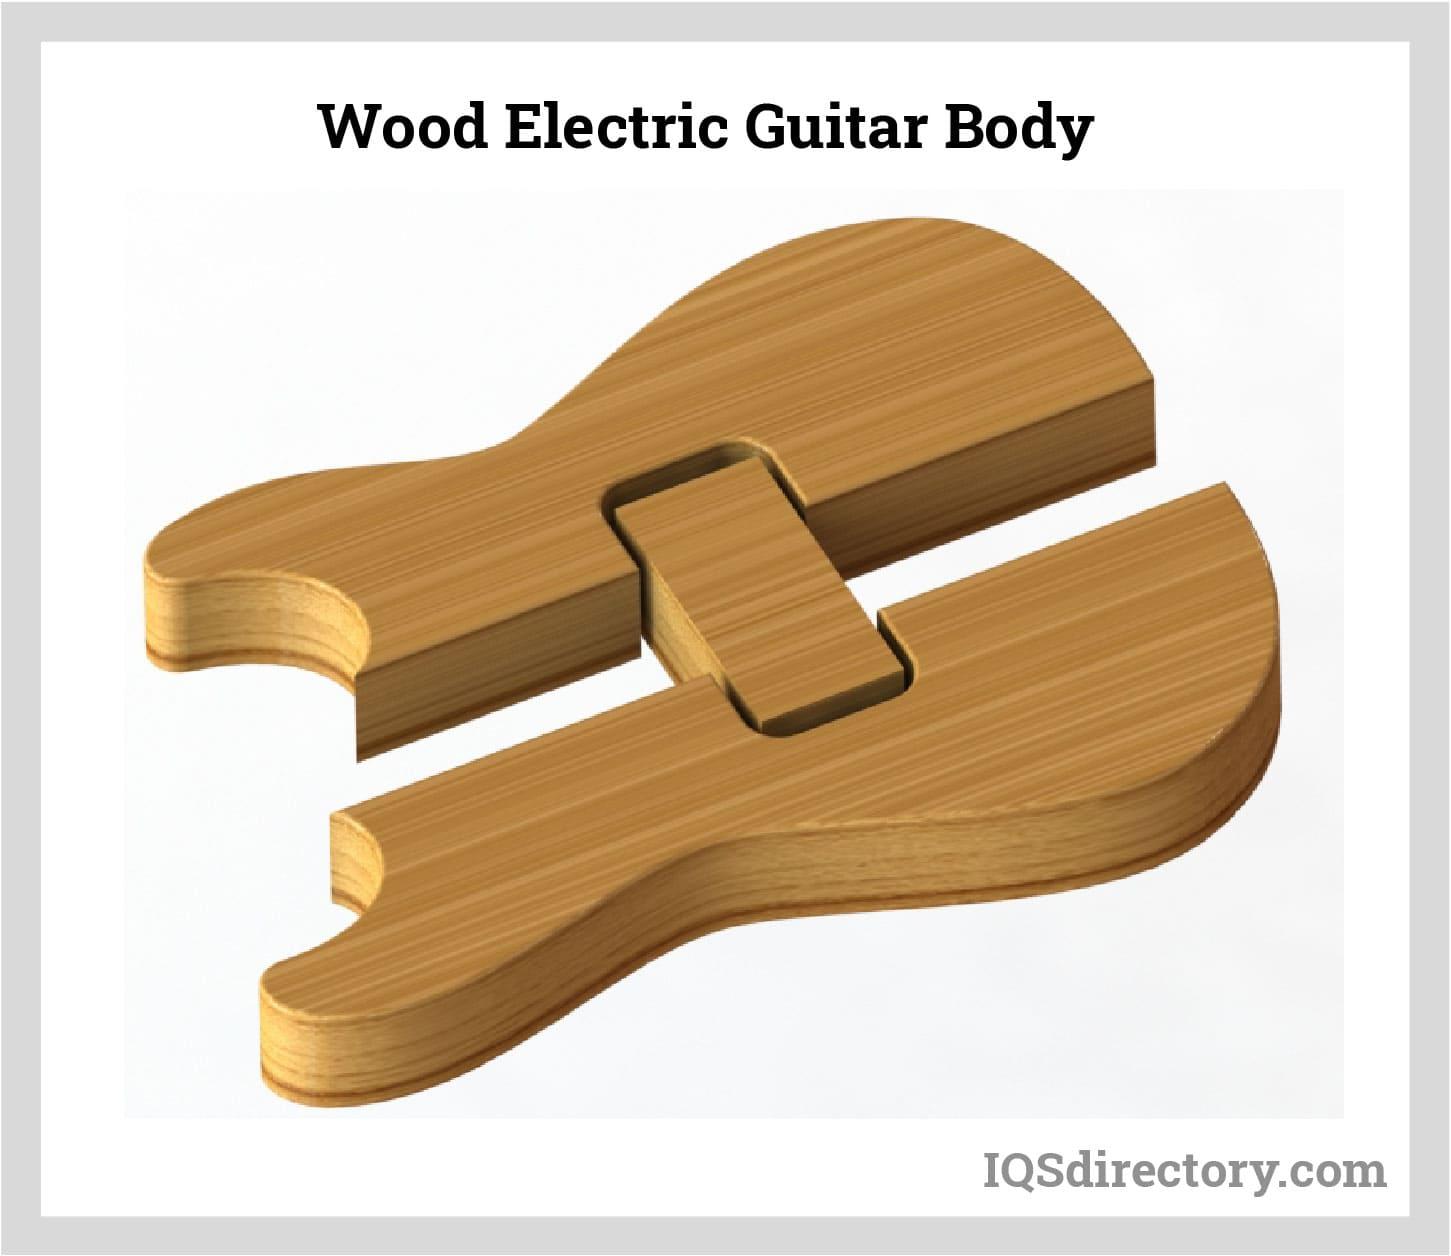 Wood Electric Guitar Body